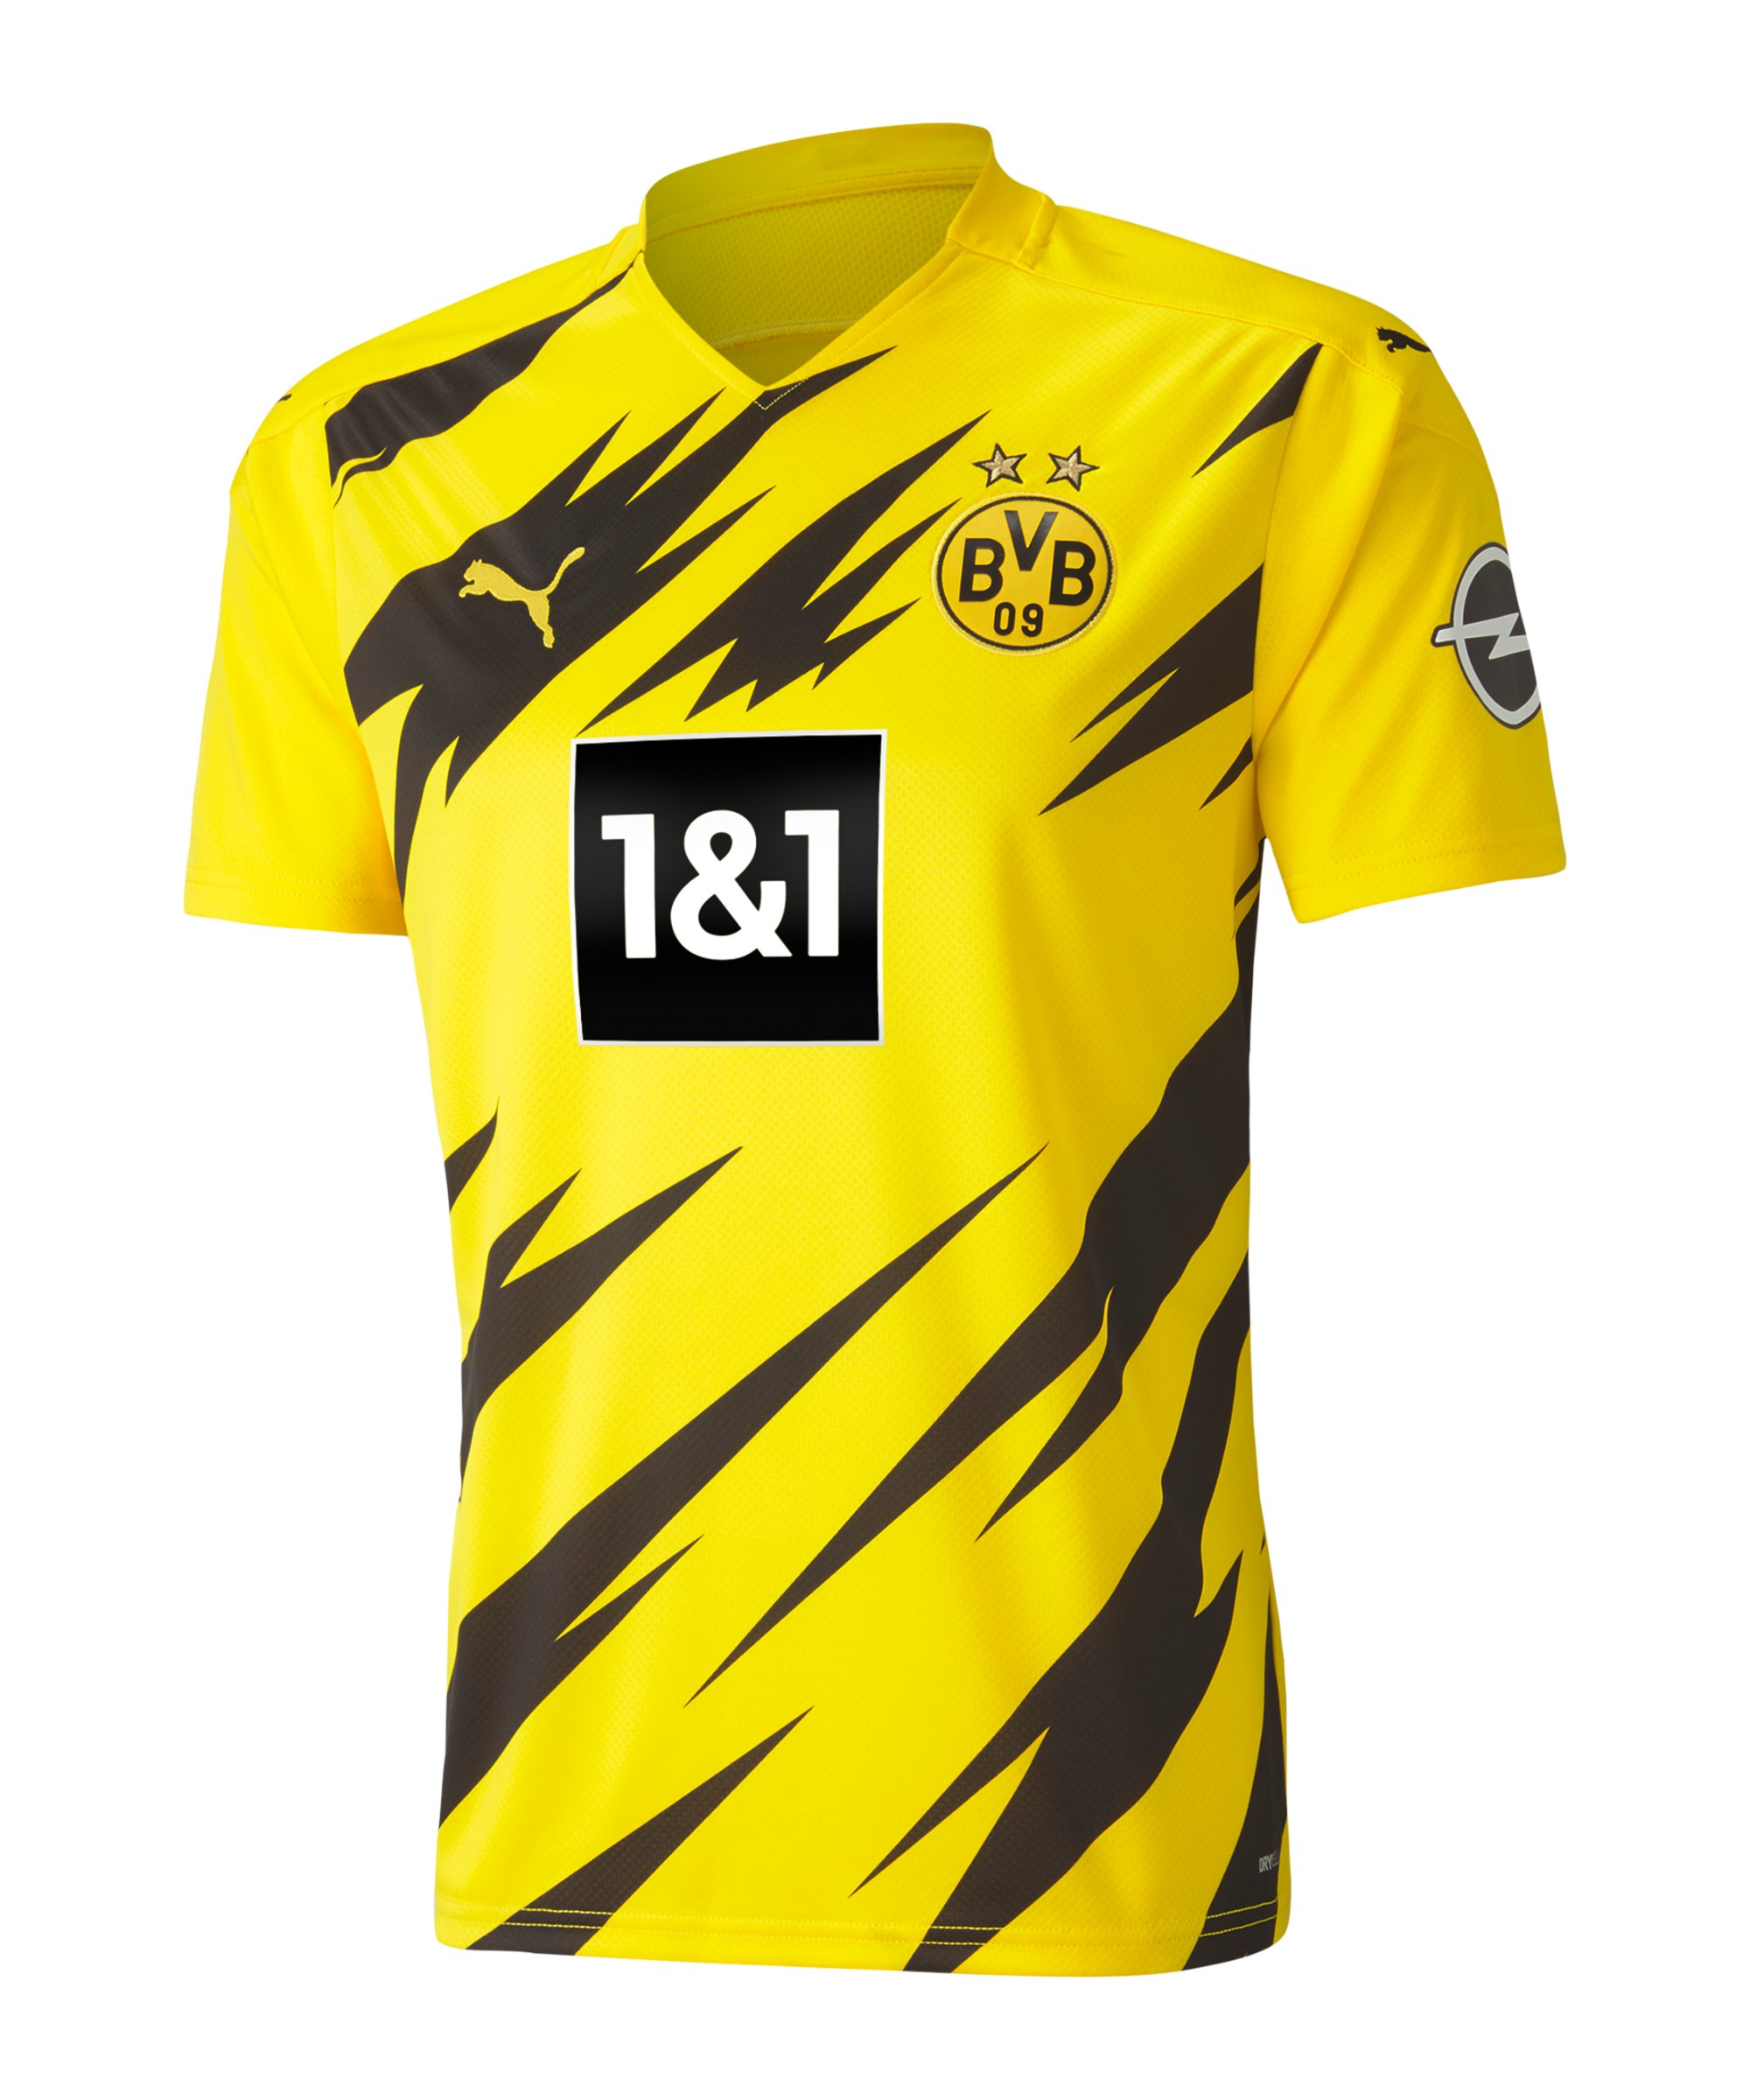 PUMA BVB Dortmund Trikot Home 2020/2021 Gelb F01 - gelb